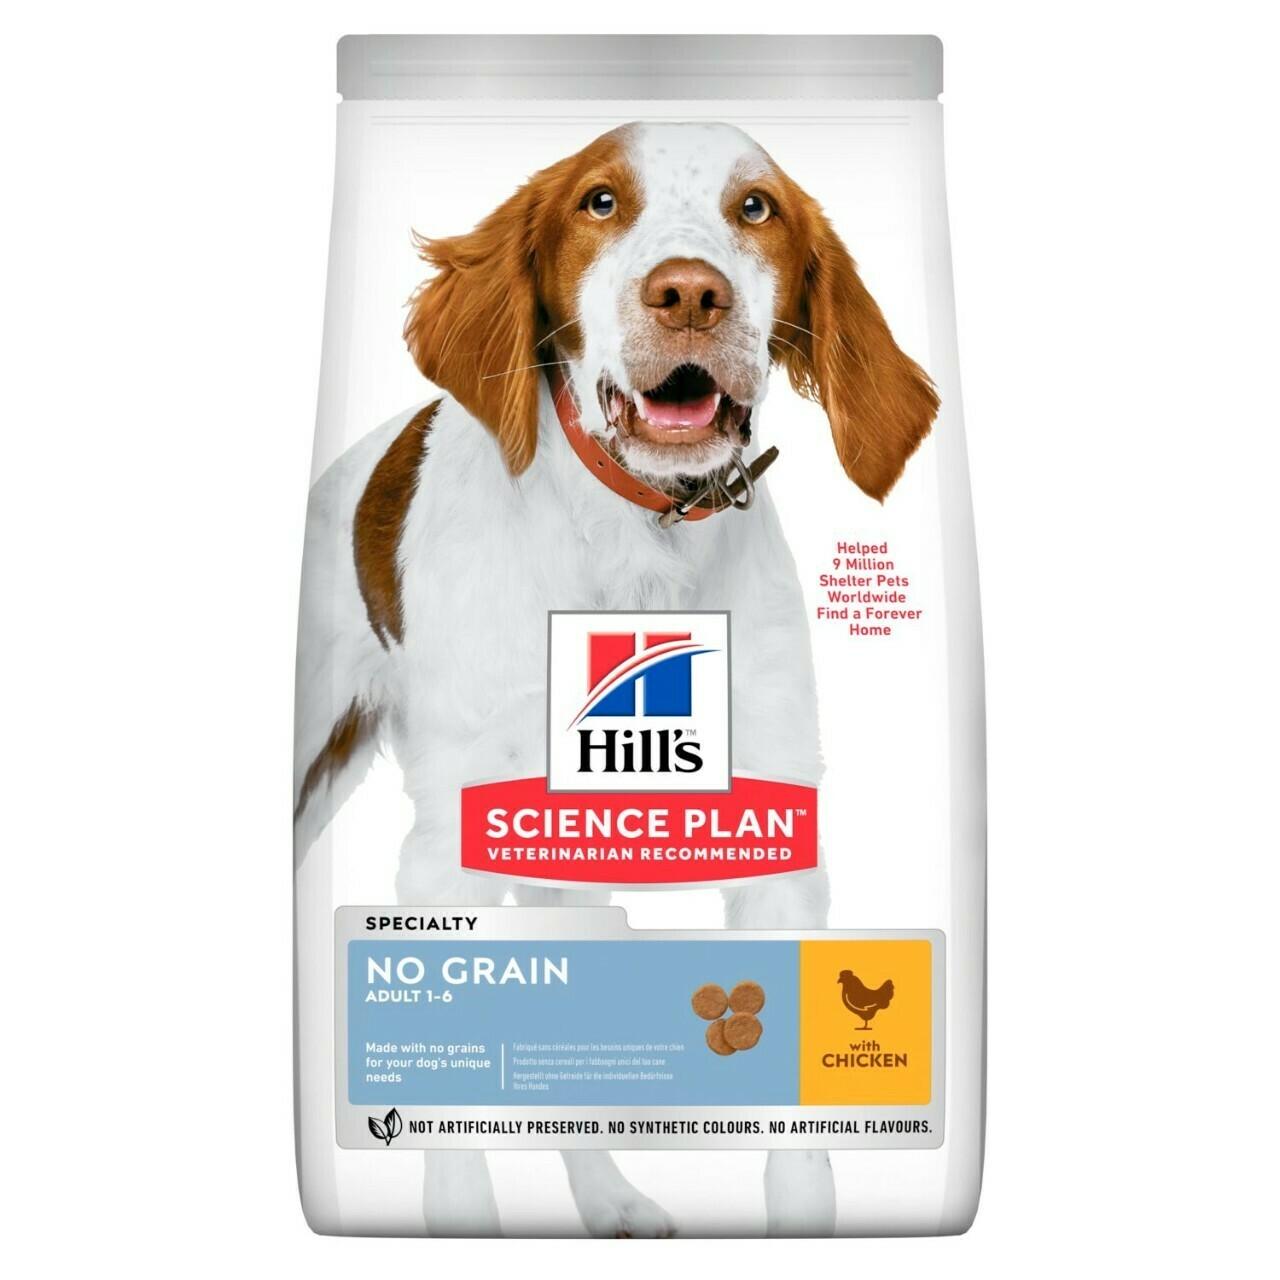 Hill's Science Plan Adult No Grain Chicken Flavour